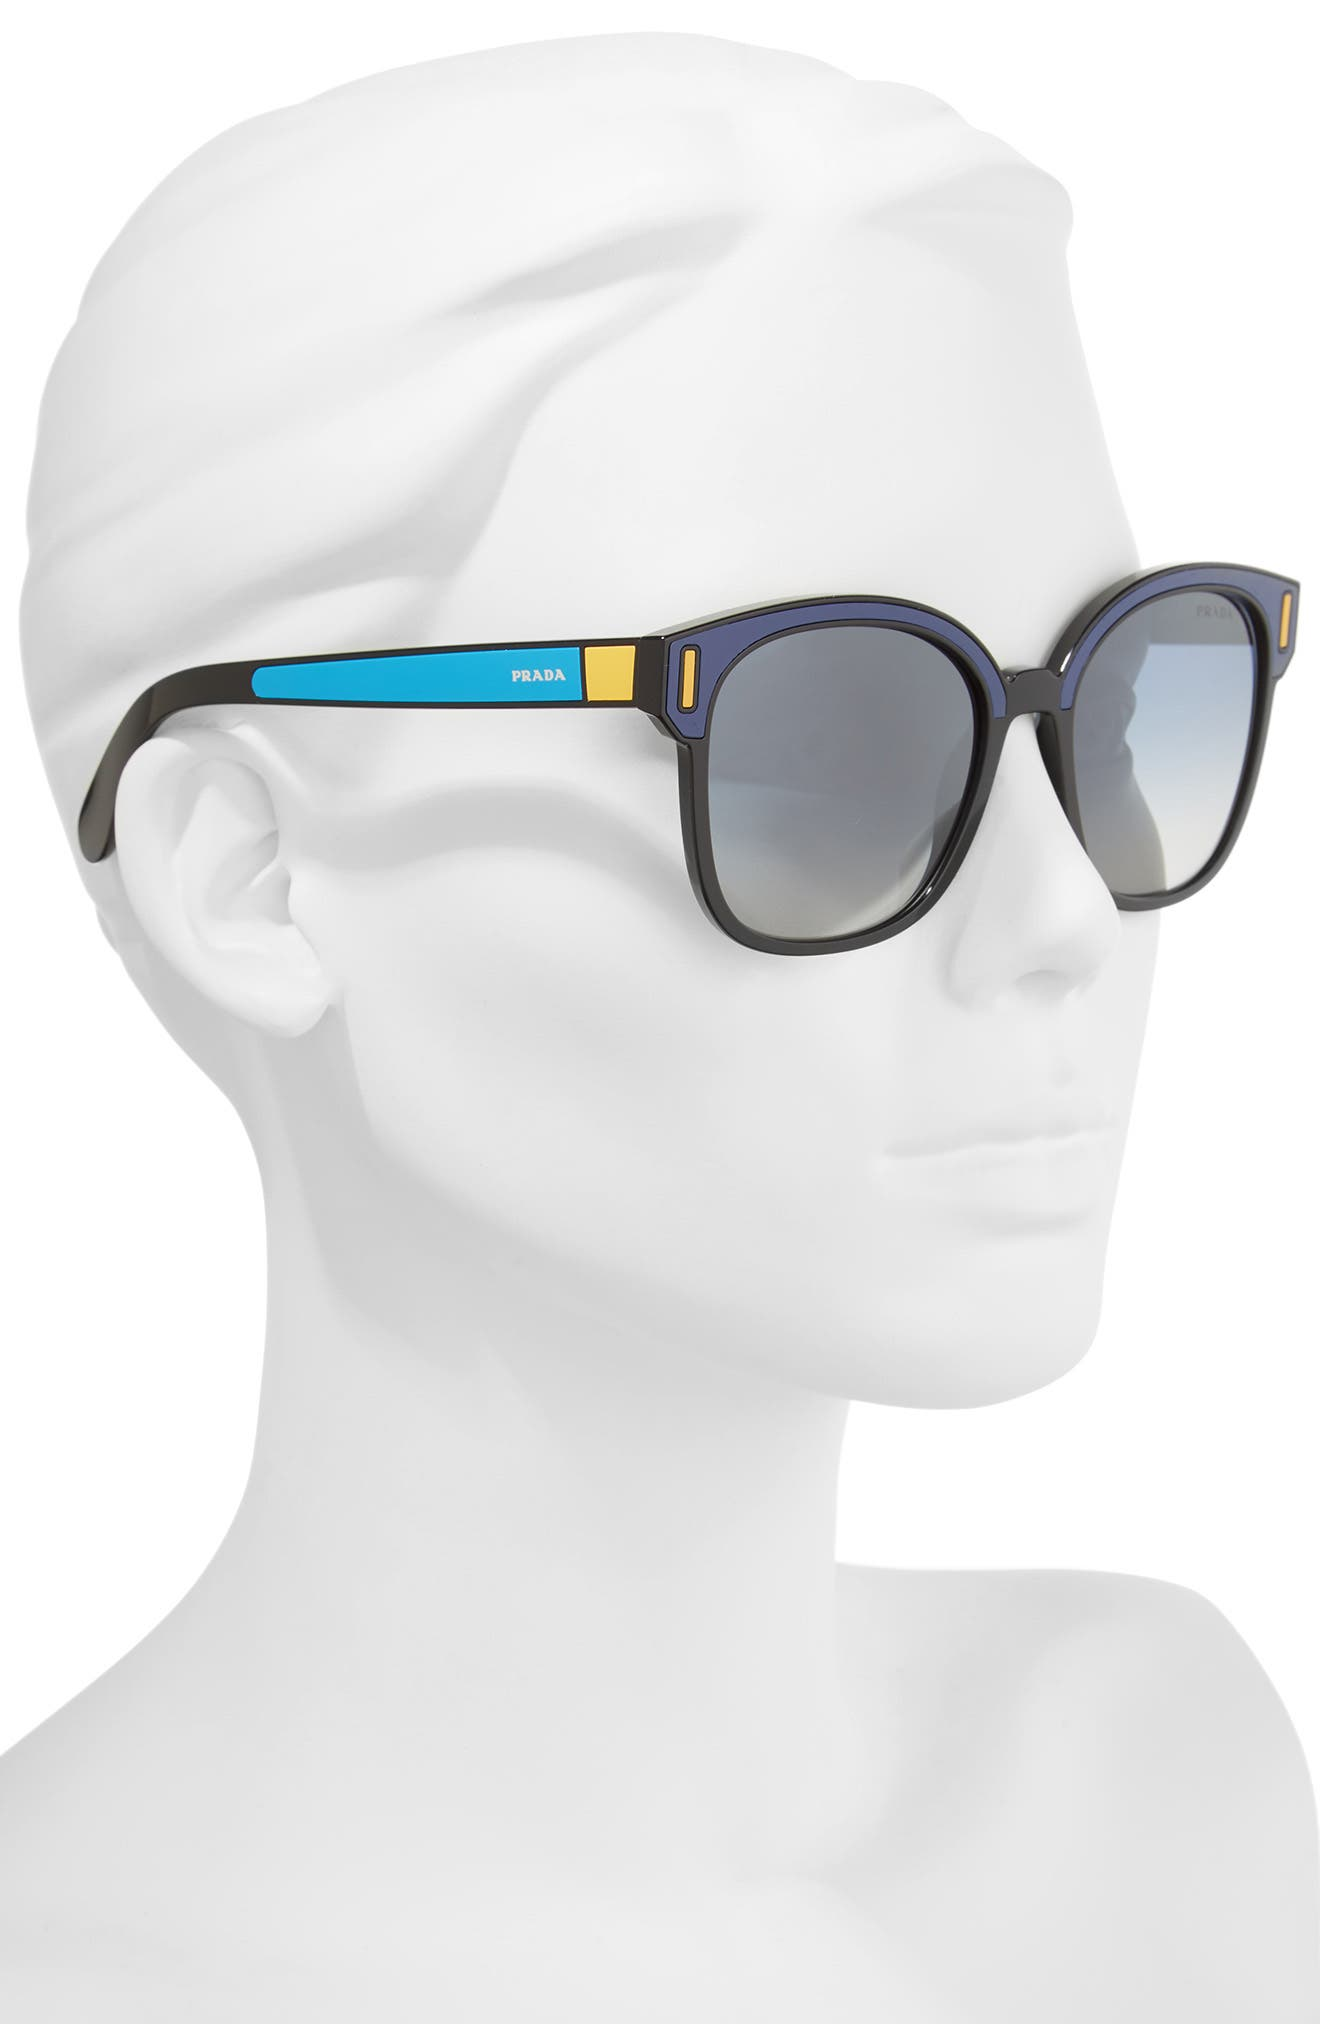 53mm Sunglasses,                             Alternate thumbnail 2, color,                             Black/ Blue